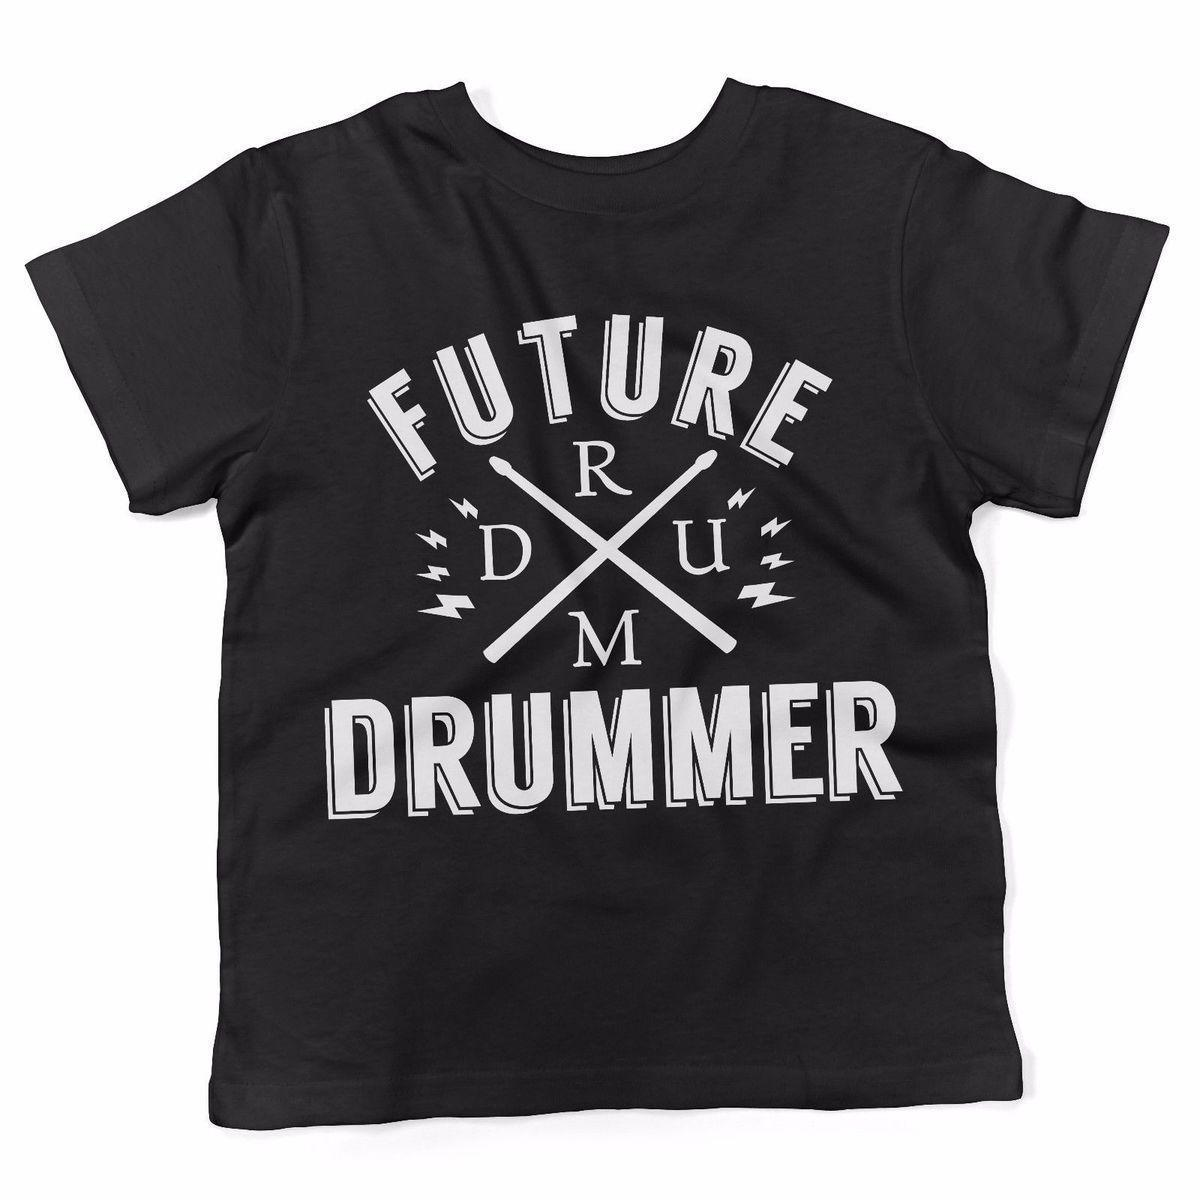 02e0ca193 Baby T Shirt Future Drummer Maglietta Abbigliamento Neonato NERO Hot New  2018 Summer Fashion T Shirts Trend T Shirts With Sayings Awesome T Shirt  Designs ...